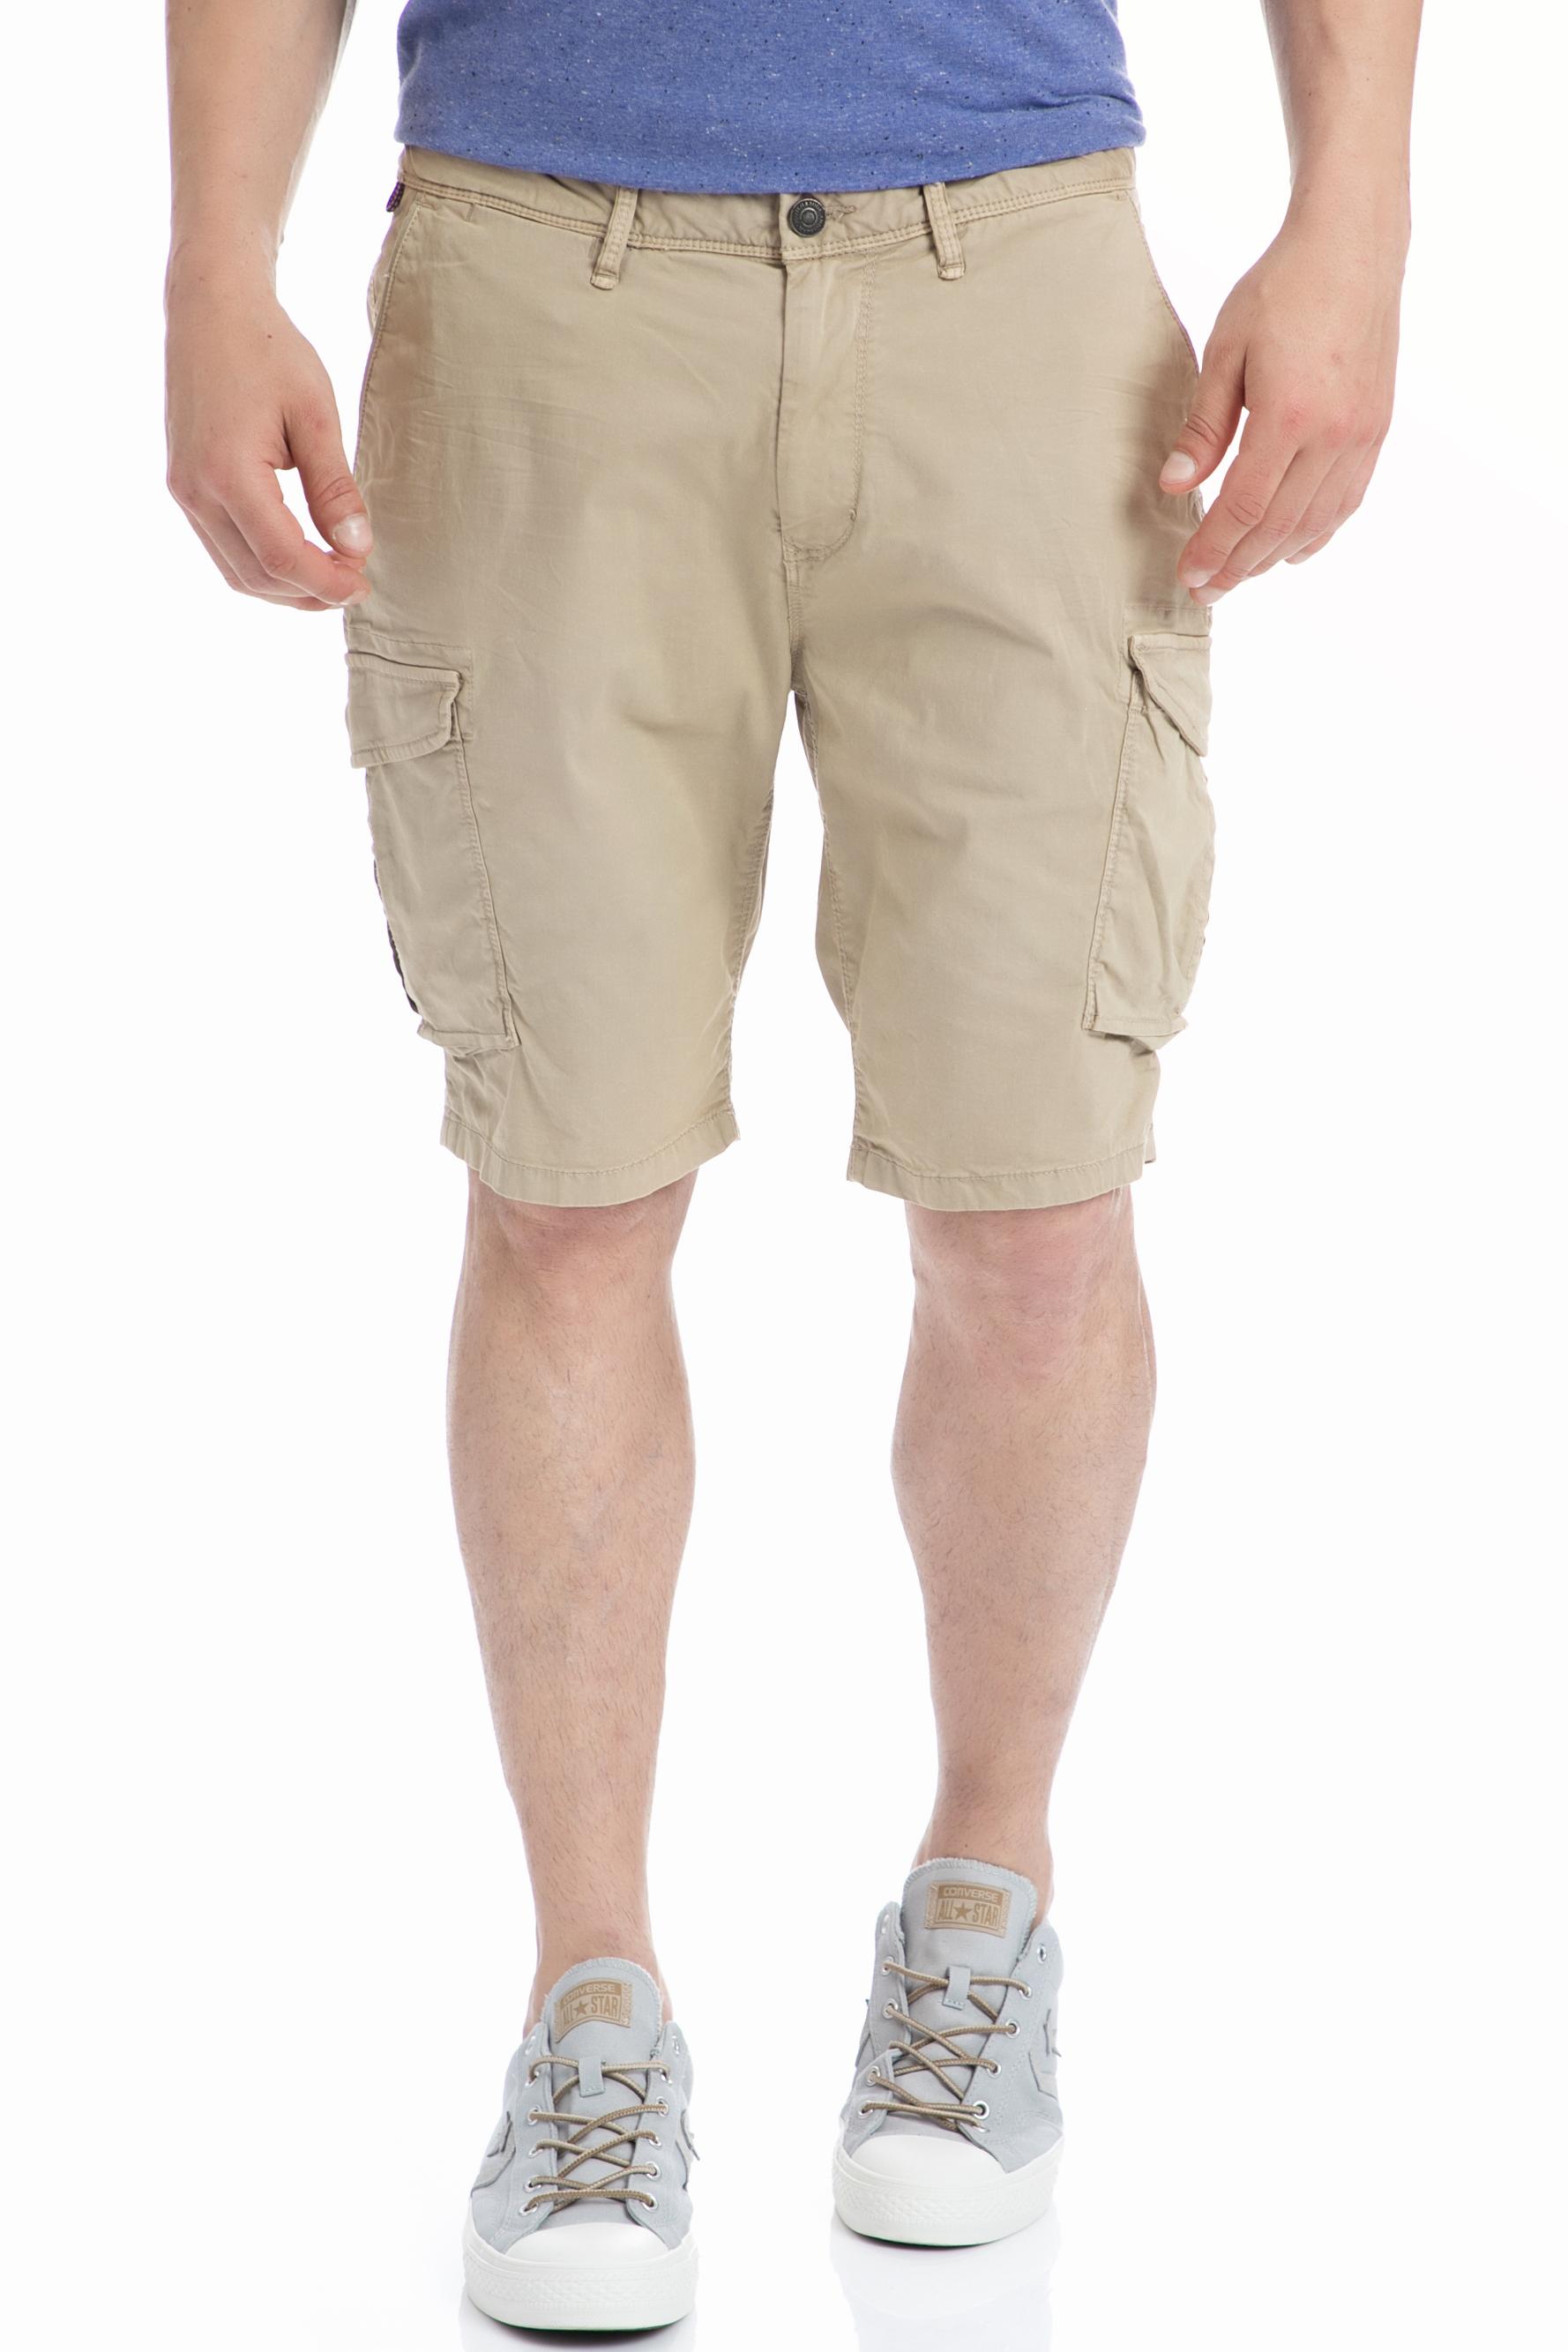 SCOTCH & SODA - Ανδρική βερμούδα SCOTCH & SODA μπεζ ανδρικά ρούχα σορτς βερμούδες casual jean